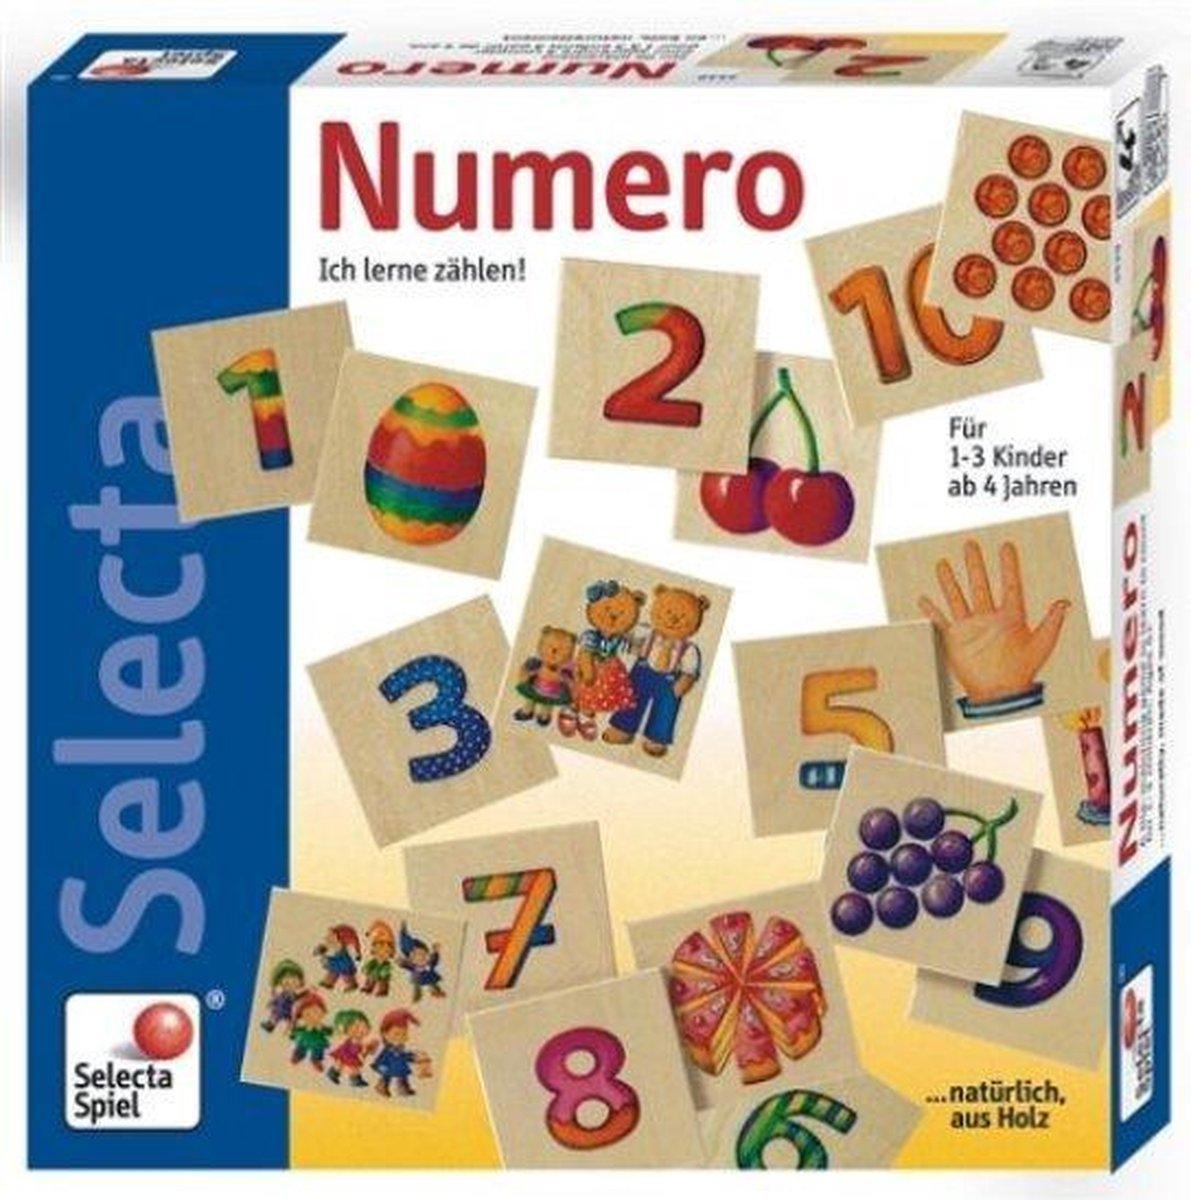 Houten spel Numero: hoeveel figuurtjes tel je?